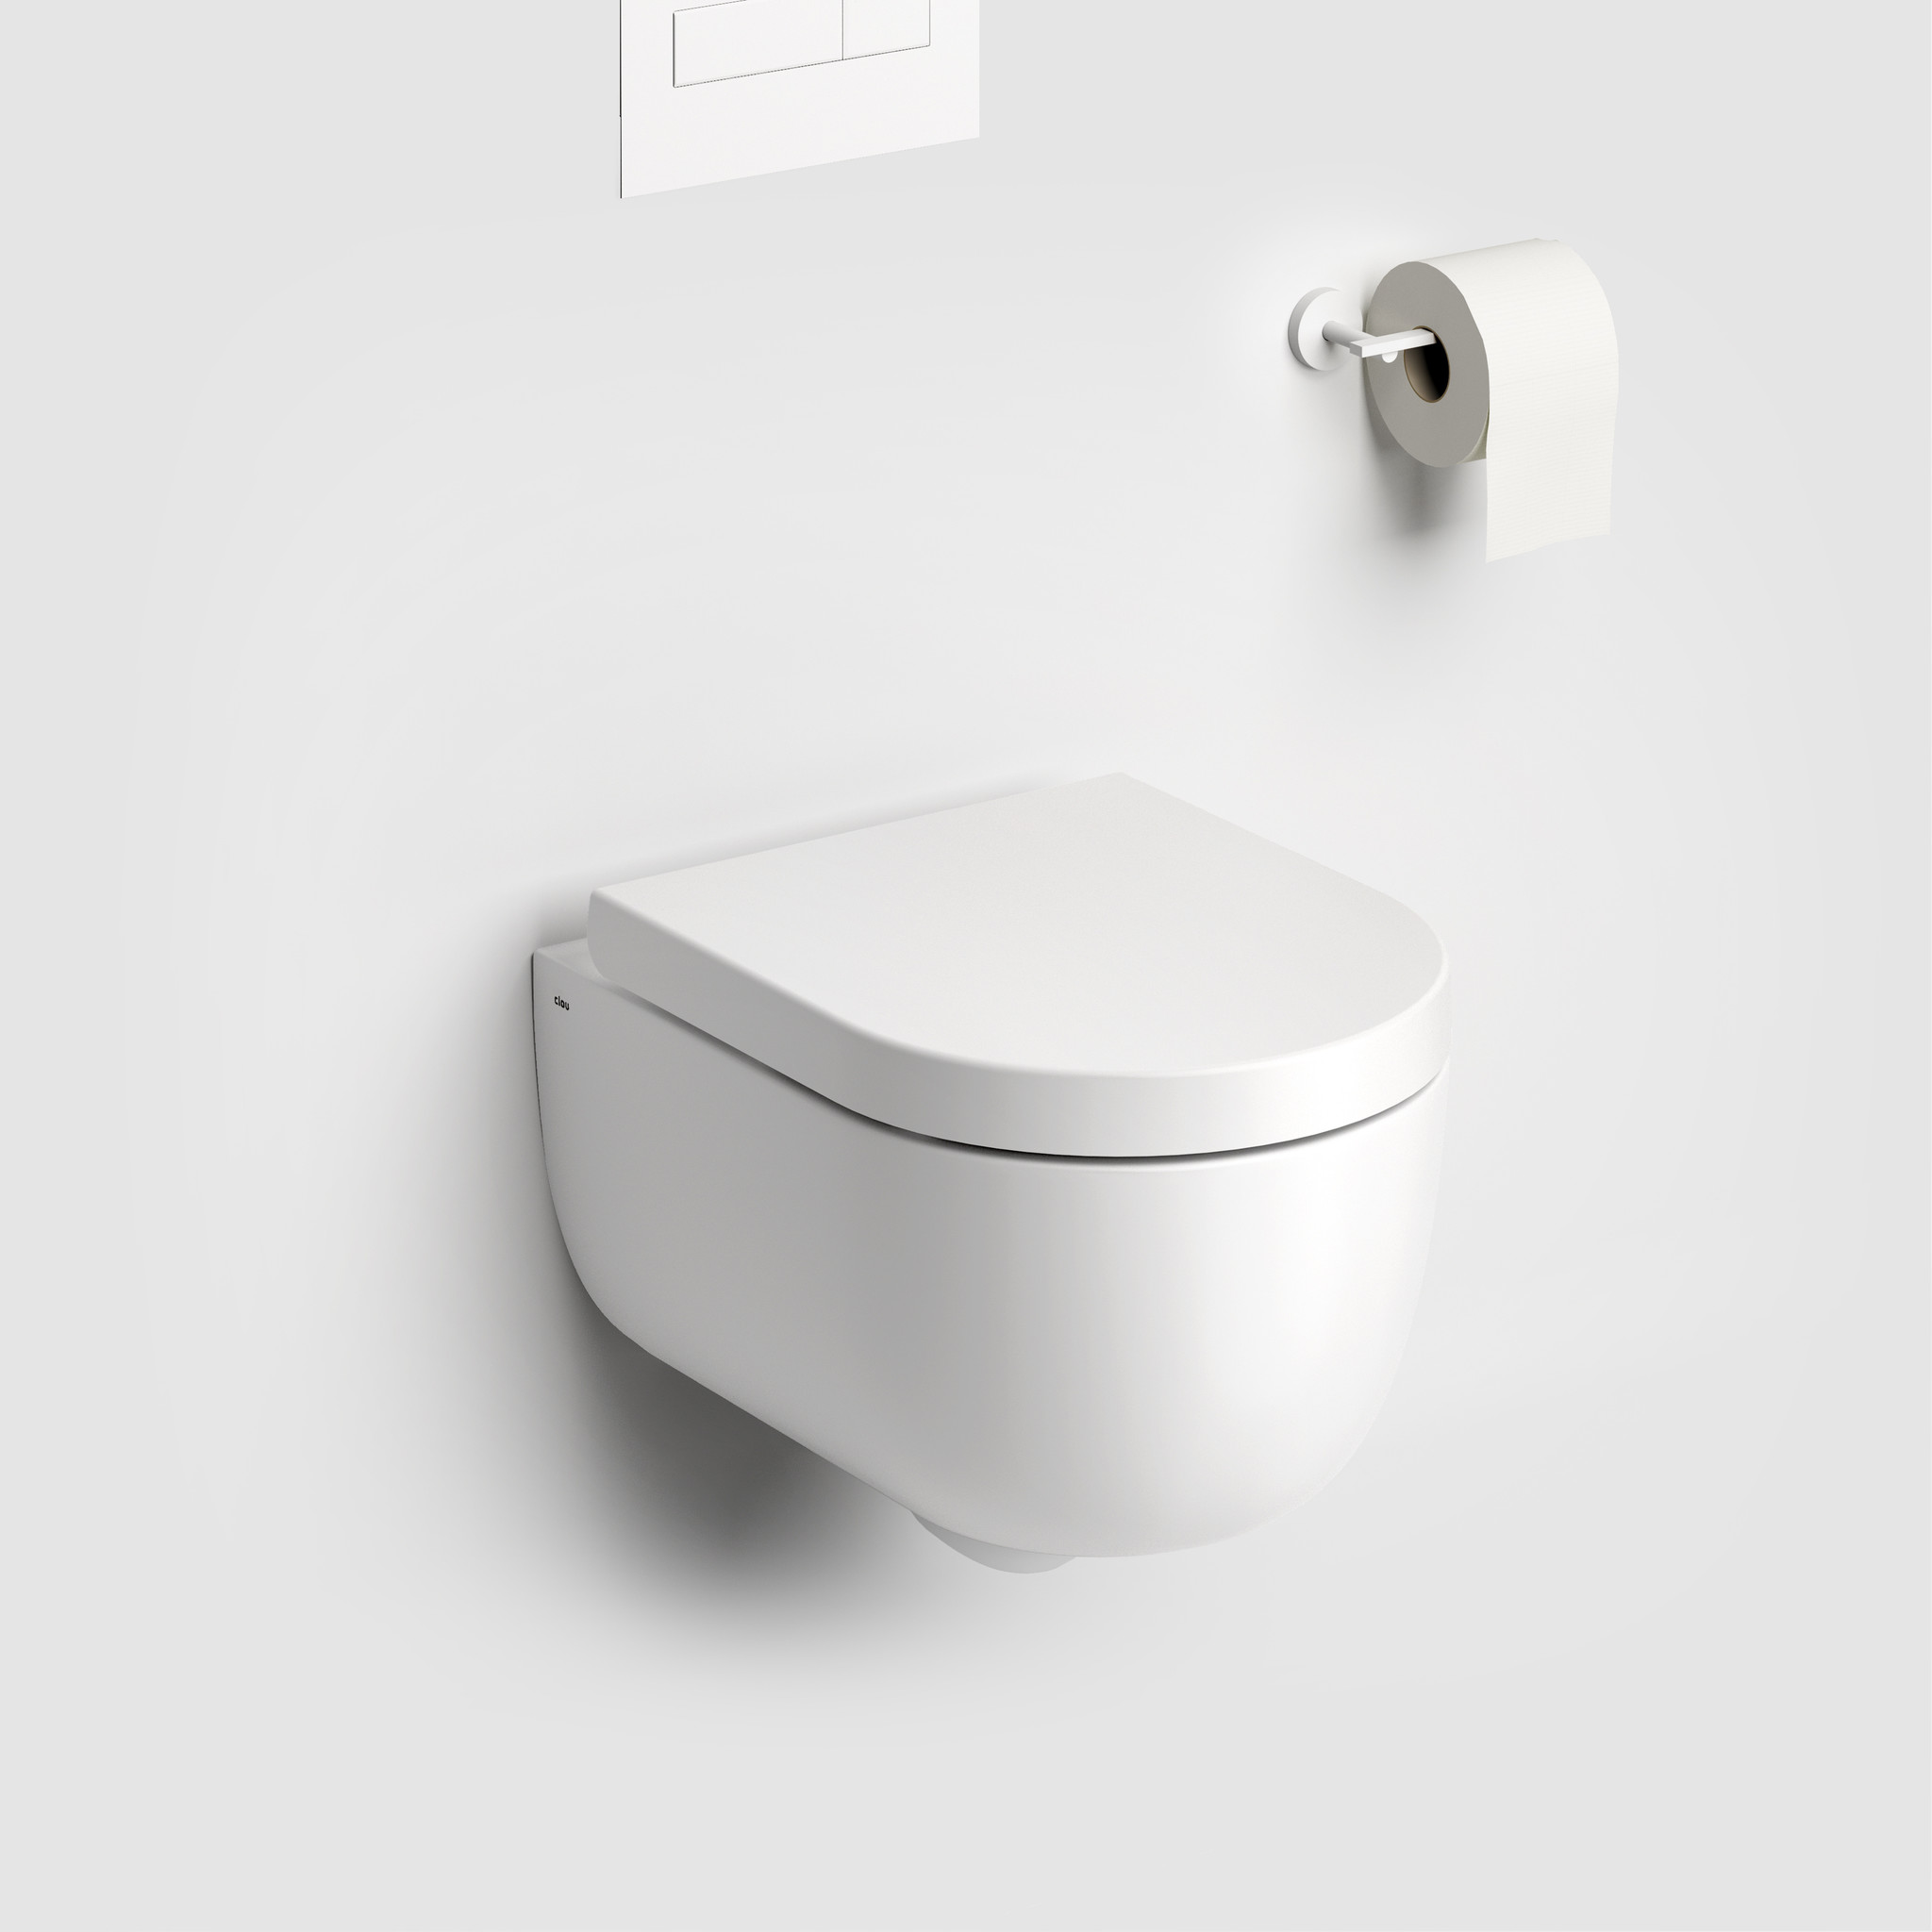 Hammock toilette 49cm sans bord, avec abattant